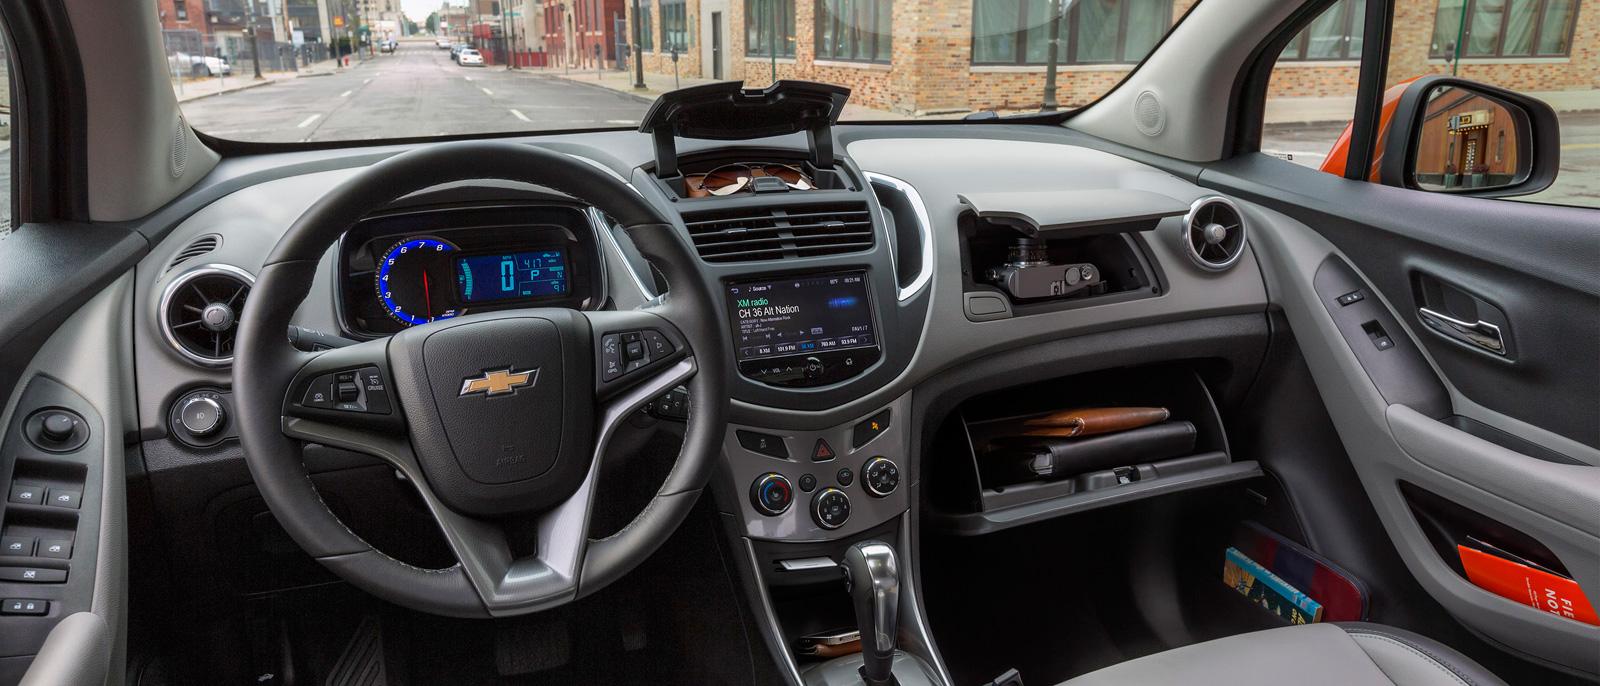 2016 Chevrolet Trax Interior